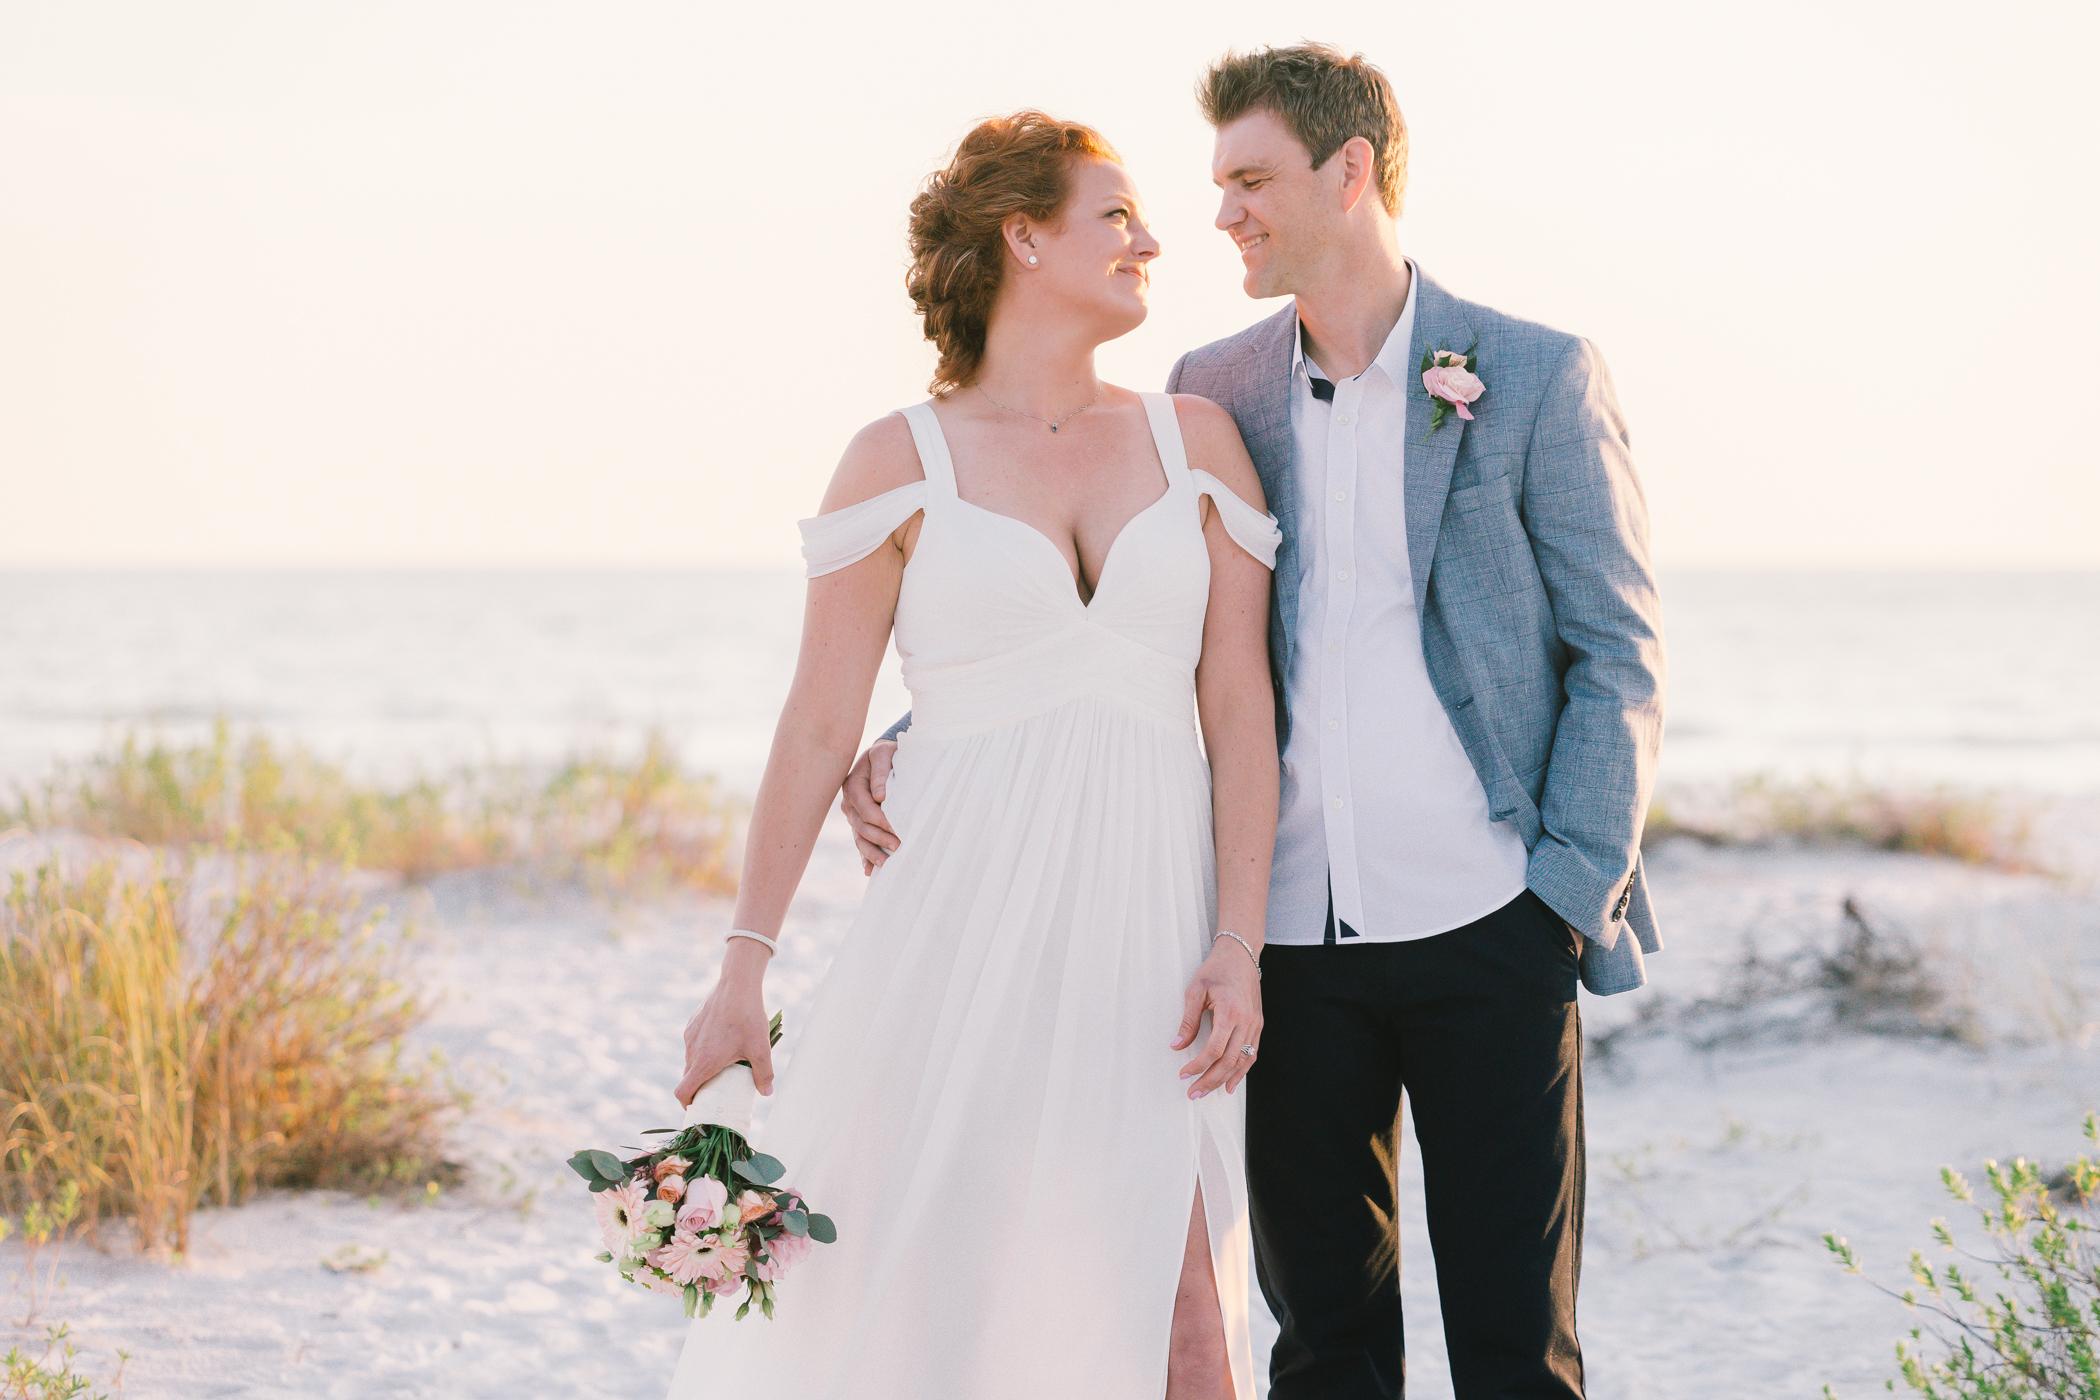 Tide-the-knot-beach-weddings, Sarasota-wedding-photo